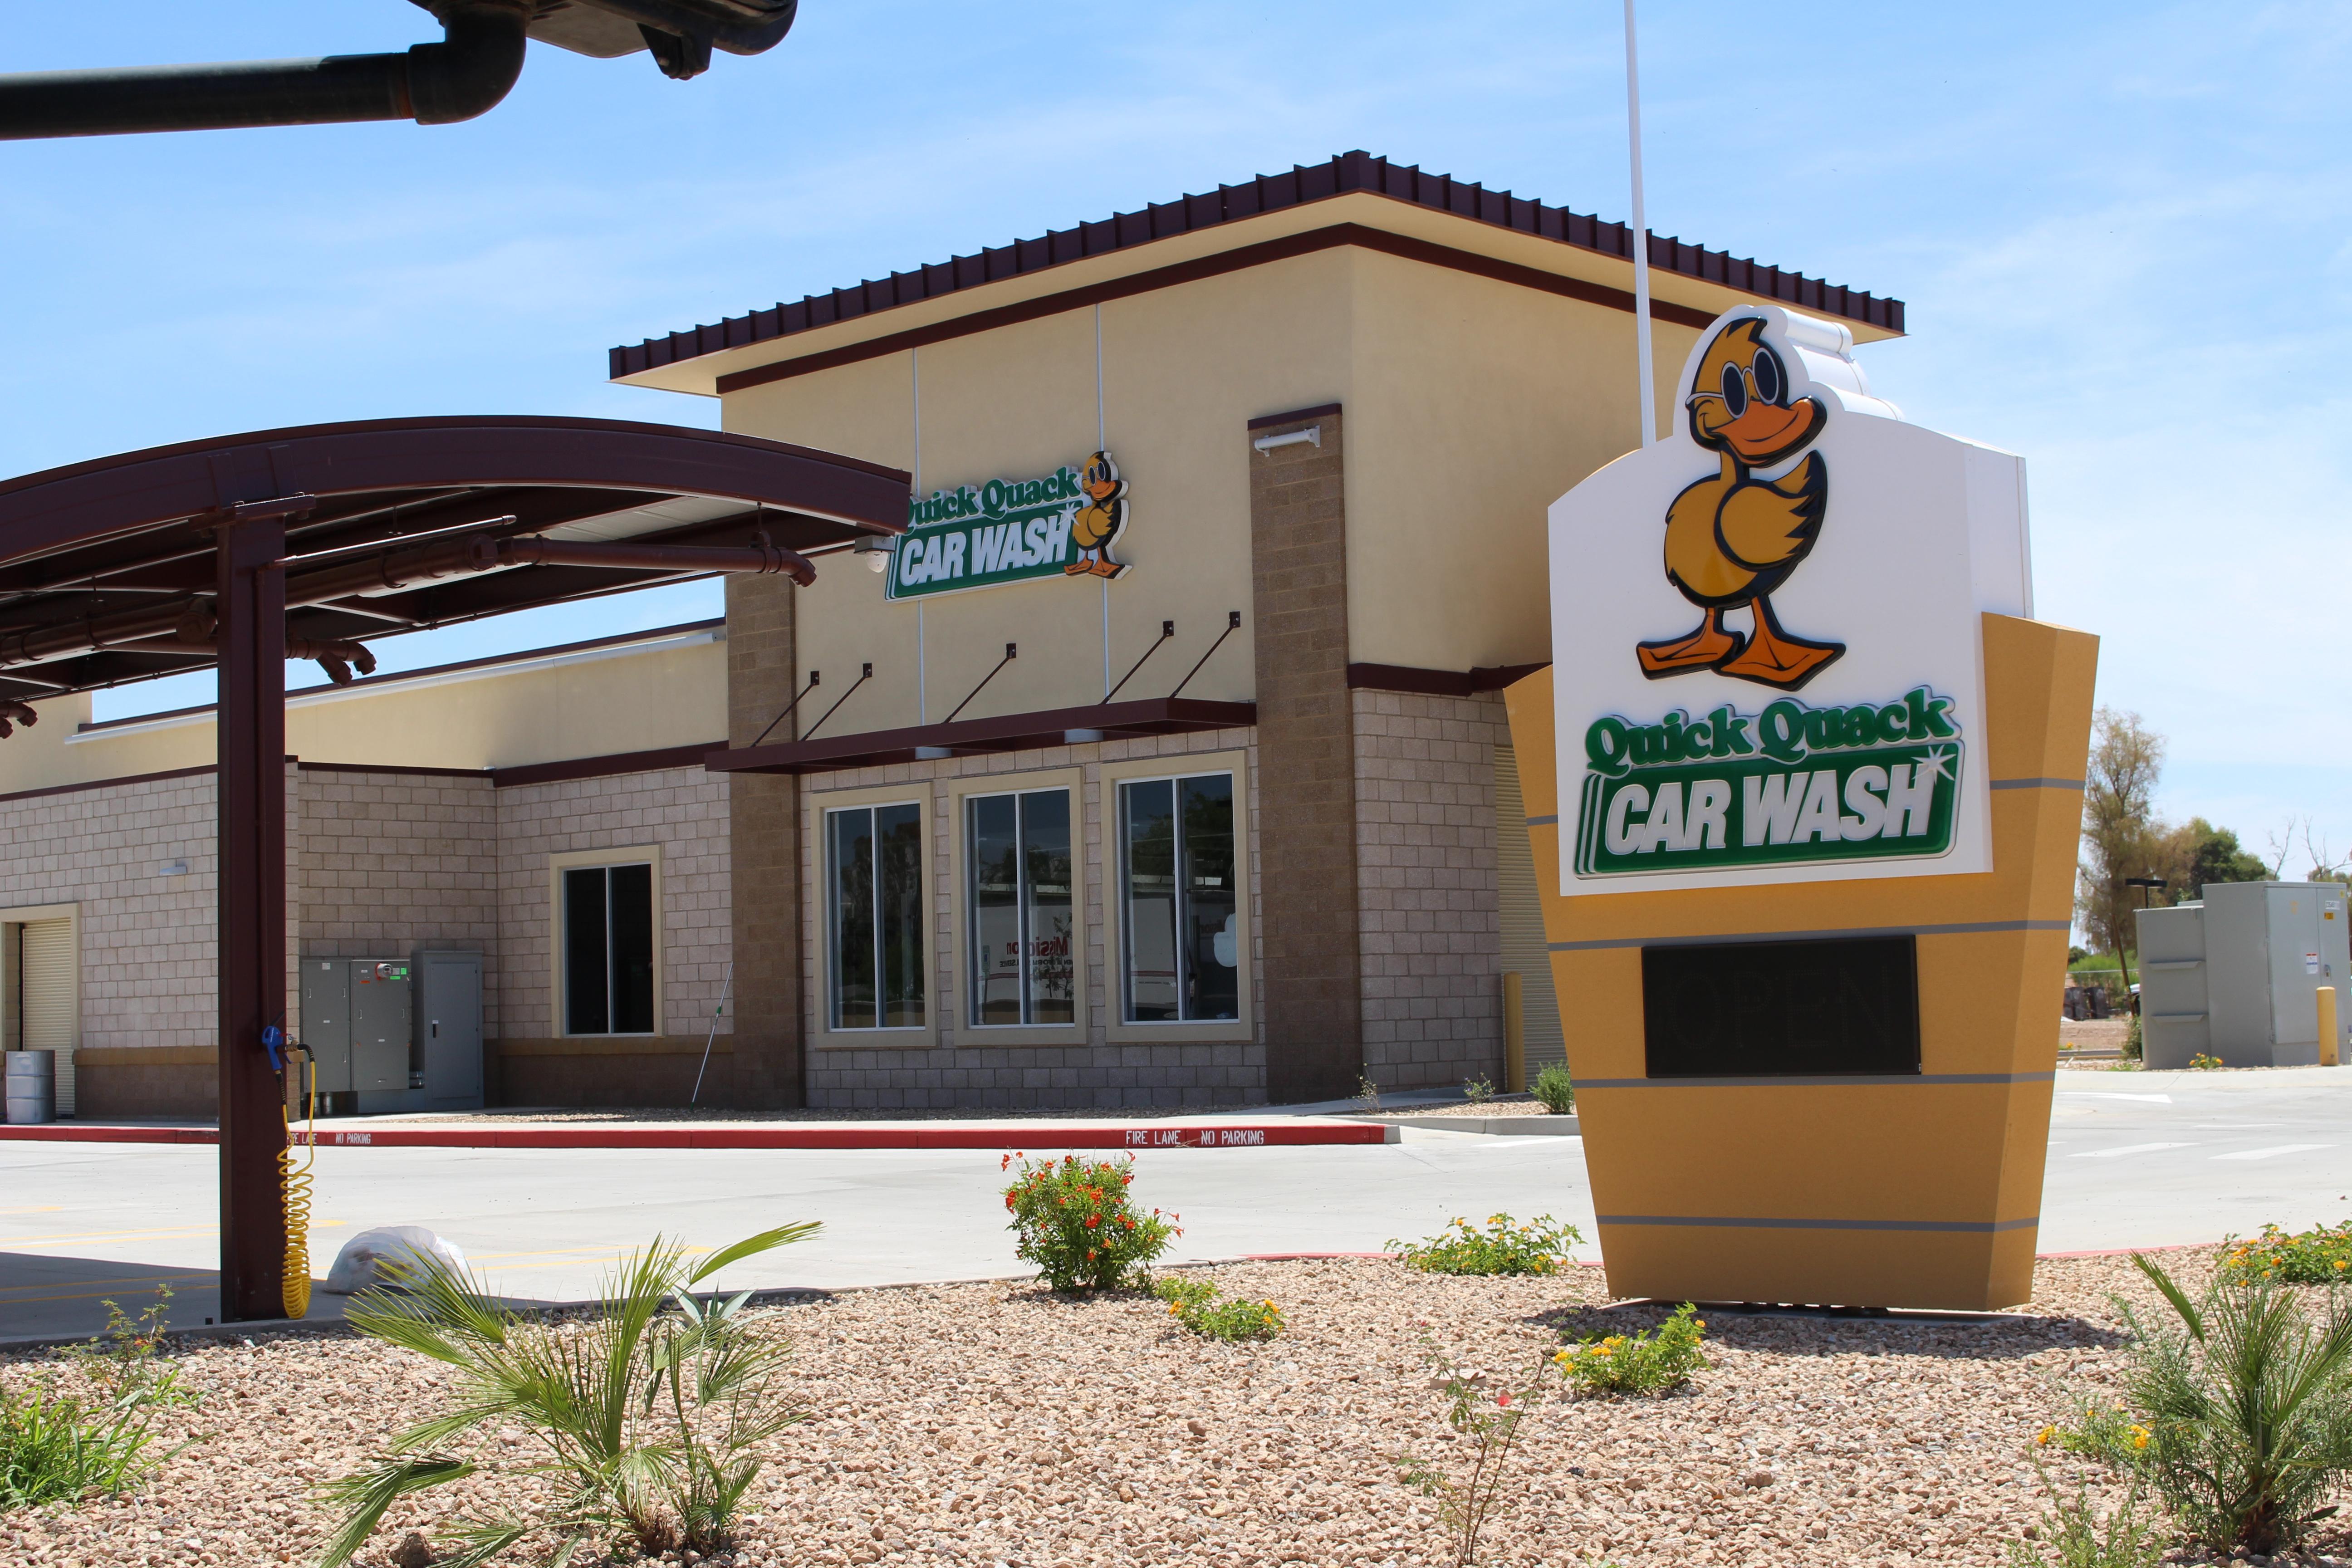 Quick Quack Car Wash has dozens of locations across Texas, Arizona, Colorado, California and Utah. (Tom Blodgett/Community Impact Newspaper)